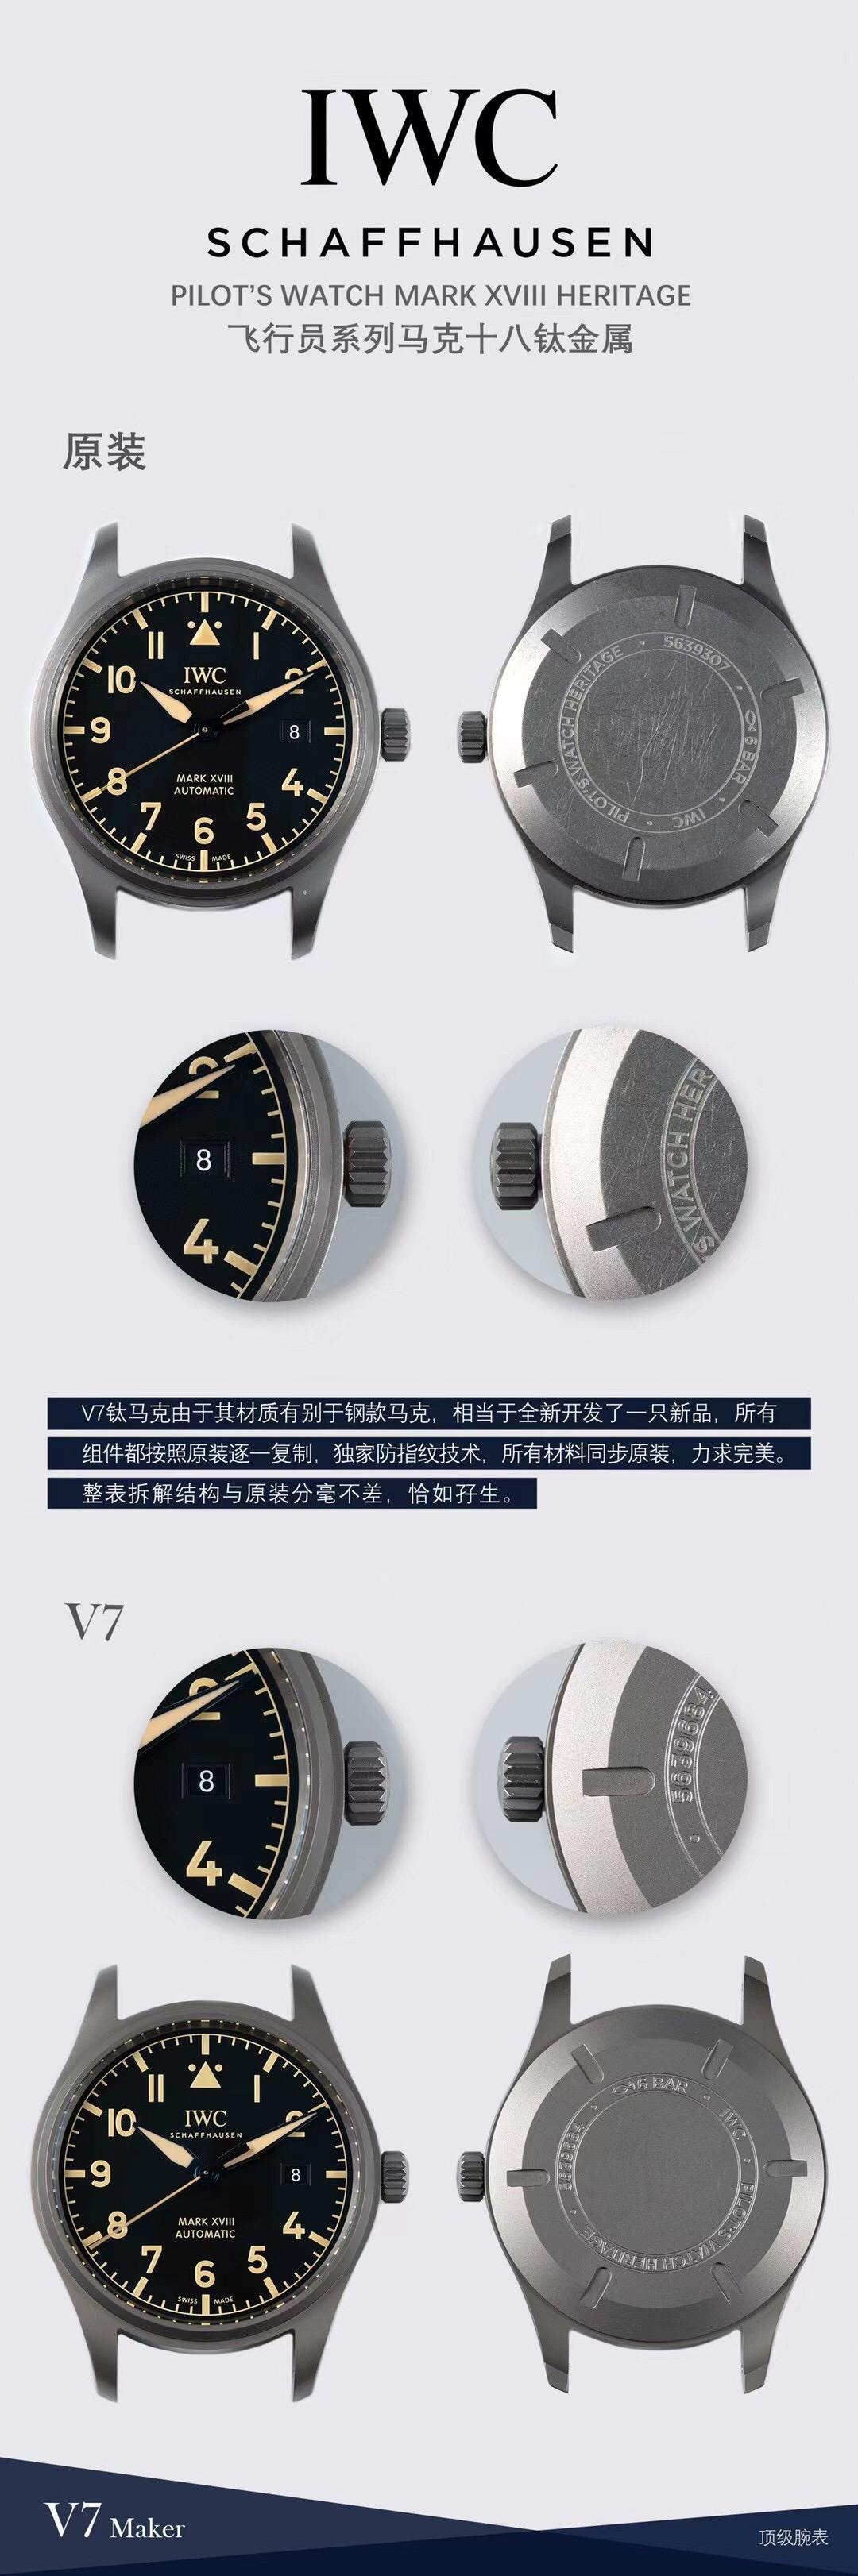 V7厂万国马克十八钛合金IW327006对比正品评测-第2张